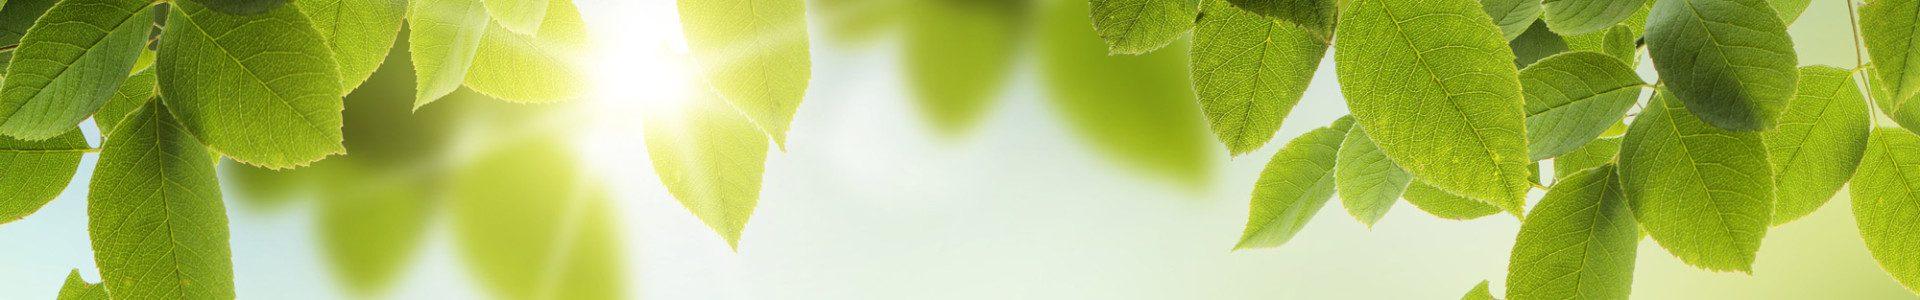 bigstock-Spring-or-summer-season-abstra-44696878-1920x300